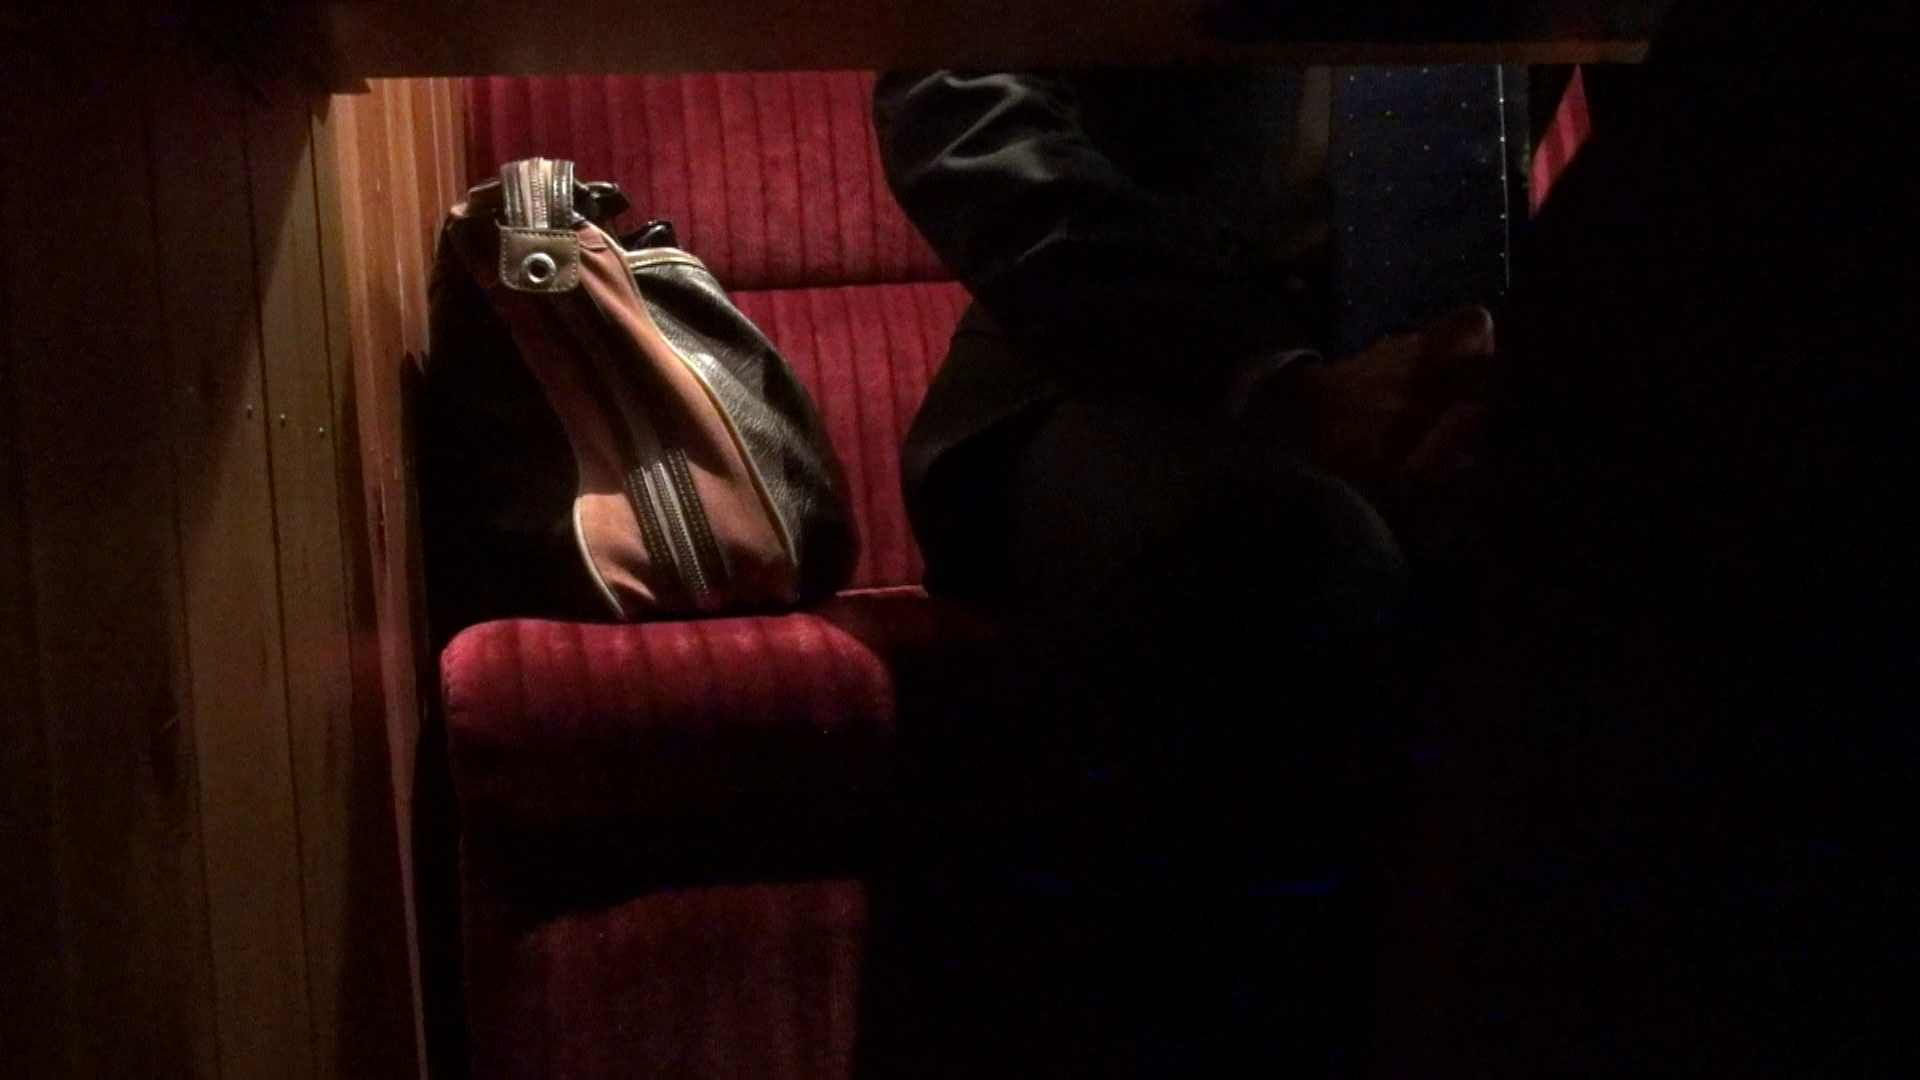 episode1 ヒロトさんと保険外交員との顔合わせ 盗撮 エロ無料画像 71pic 52